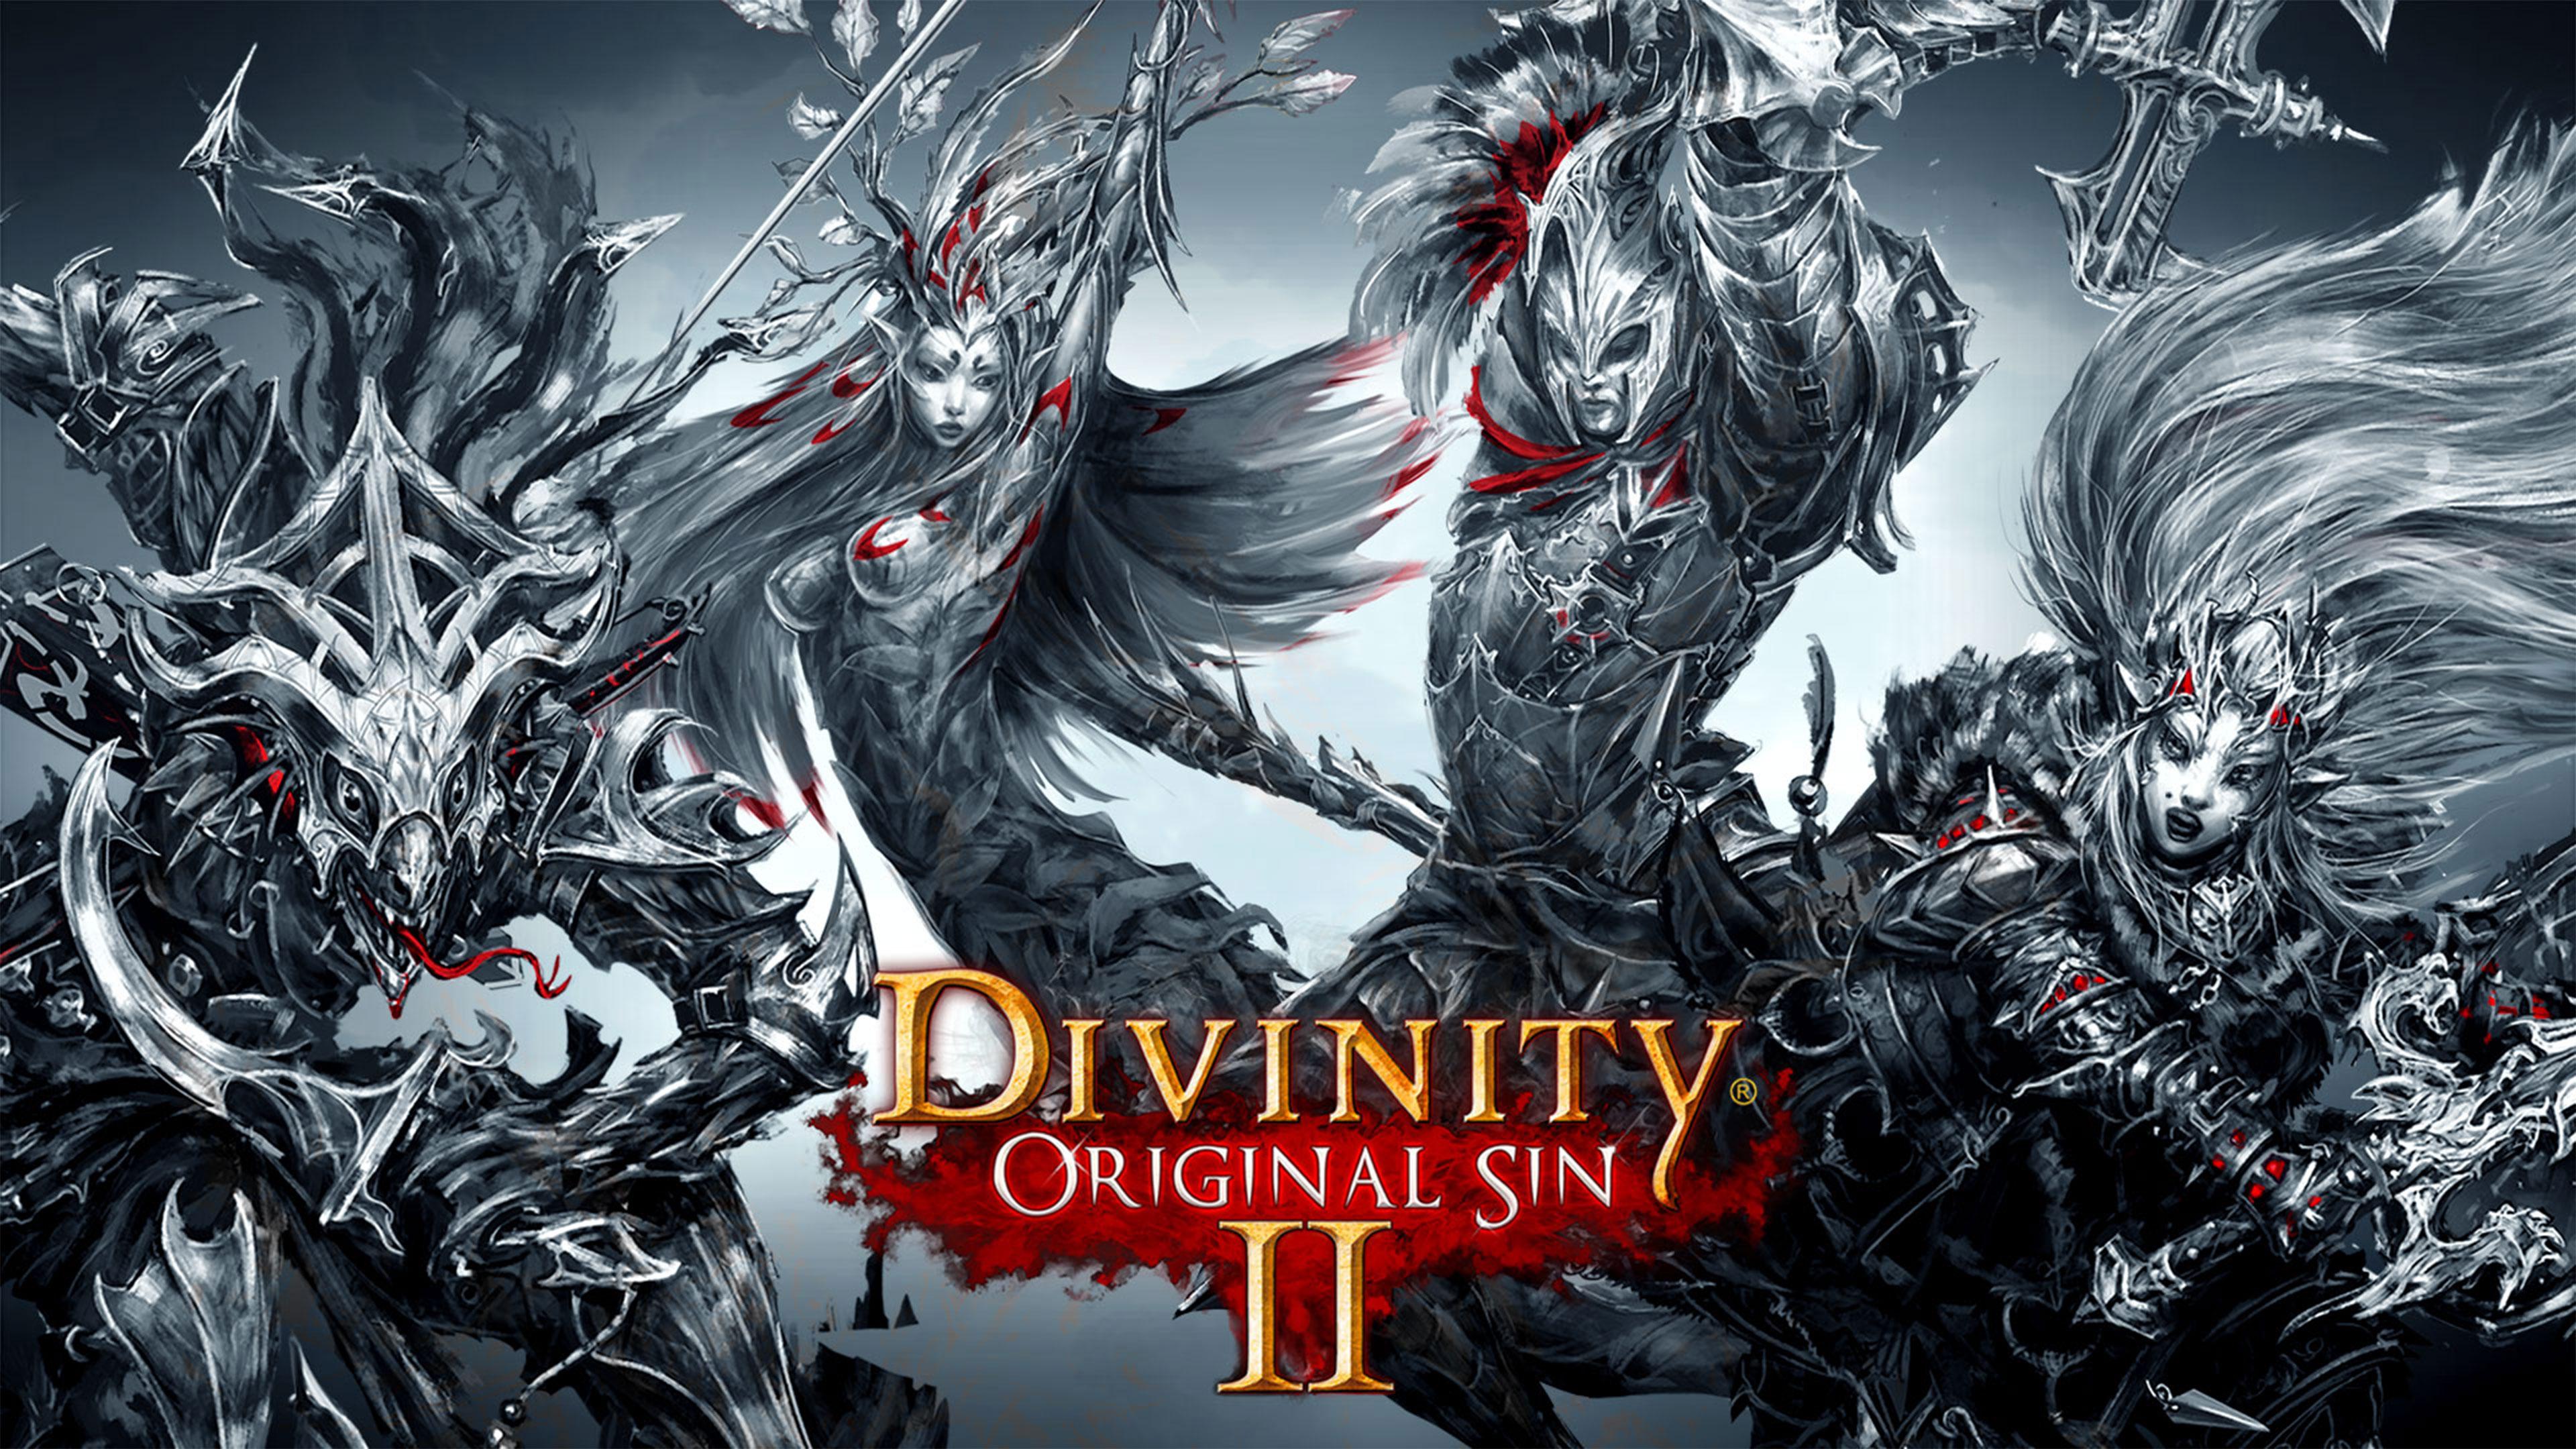 Divinity: Original Sin II Definitive Edi-Divinity: Original Sin II Definitive Edition Preview releasing on Xbox One  May 16-8